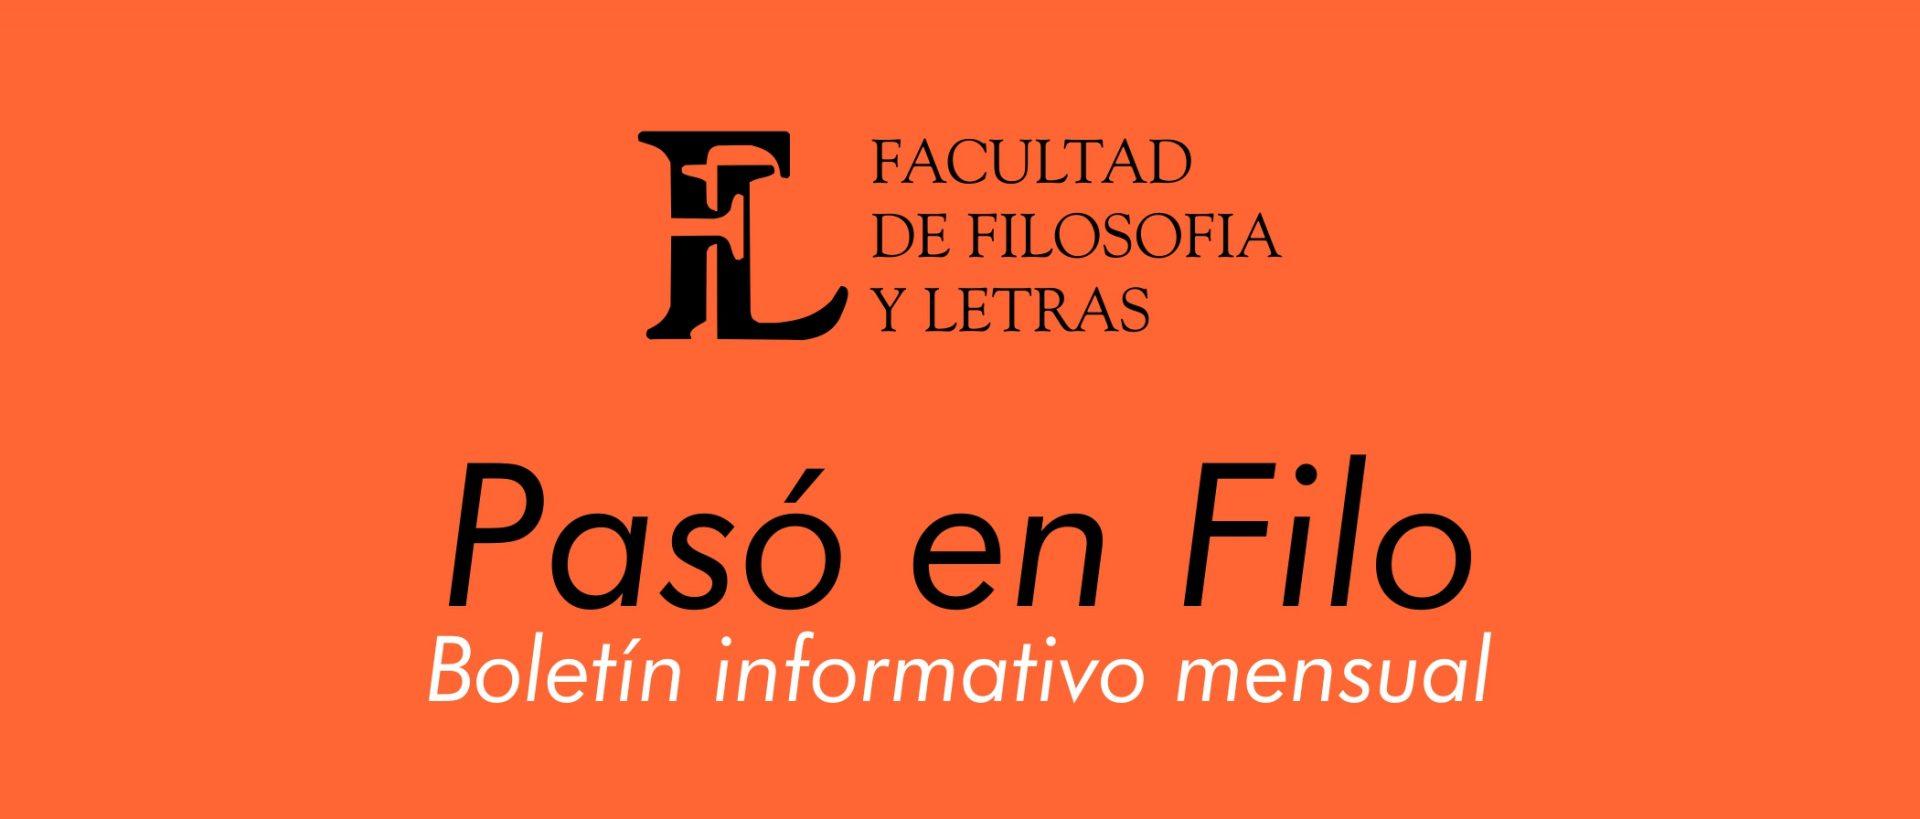 header sitio noticias filosofia_boton_para_filo